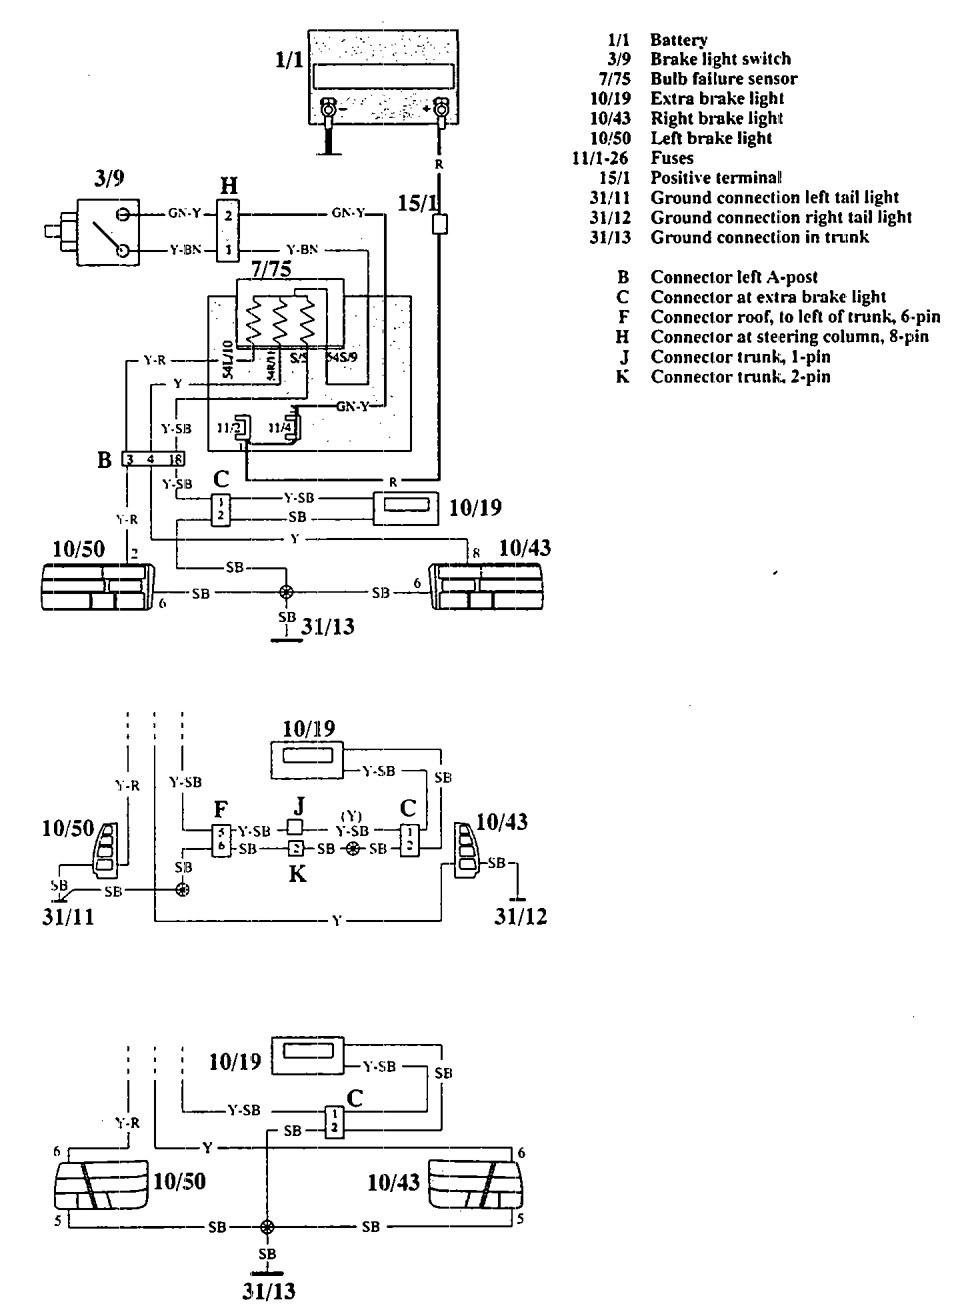 1995 volvo 940 radio wiring wiring diagram 1995 volvo 940 radio wiring  diagram 92 volvo 940